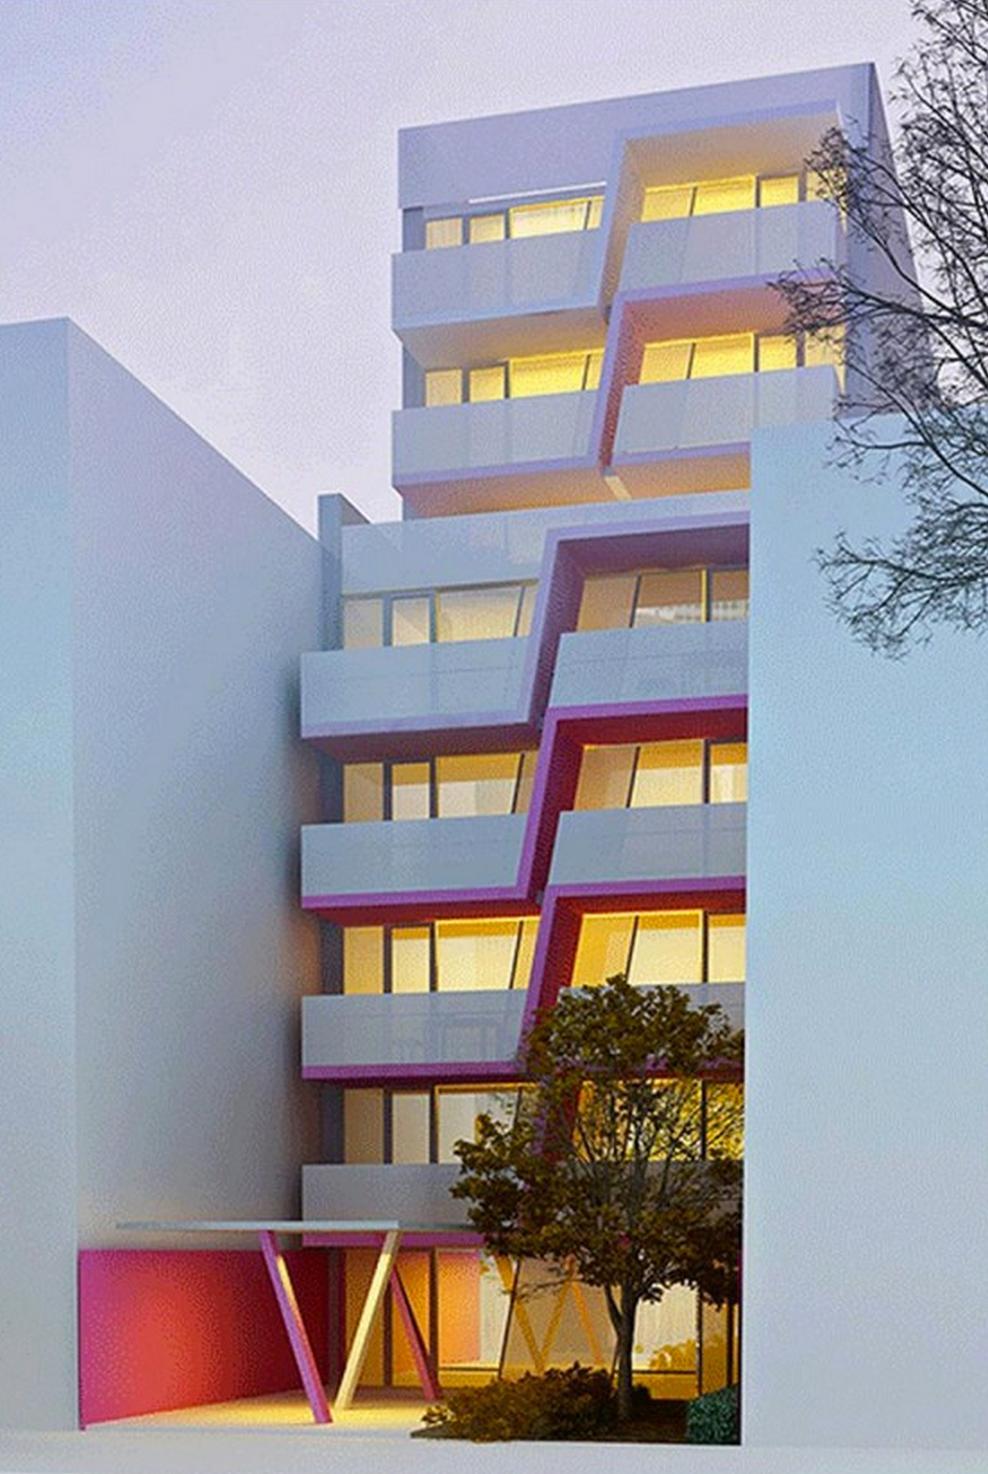 Latest design for 329 Pleasant Avenue, rendering by Karim Rashid